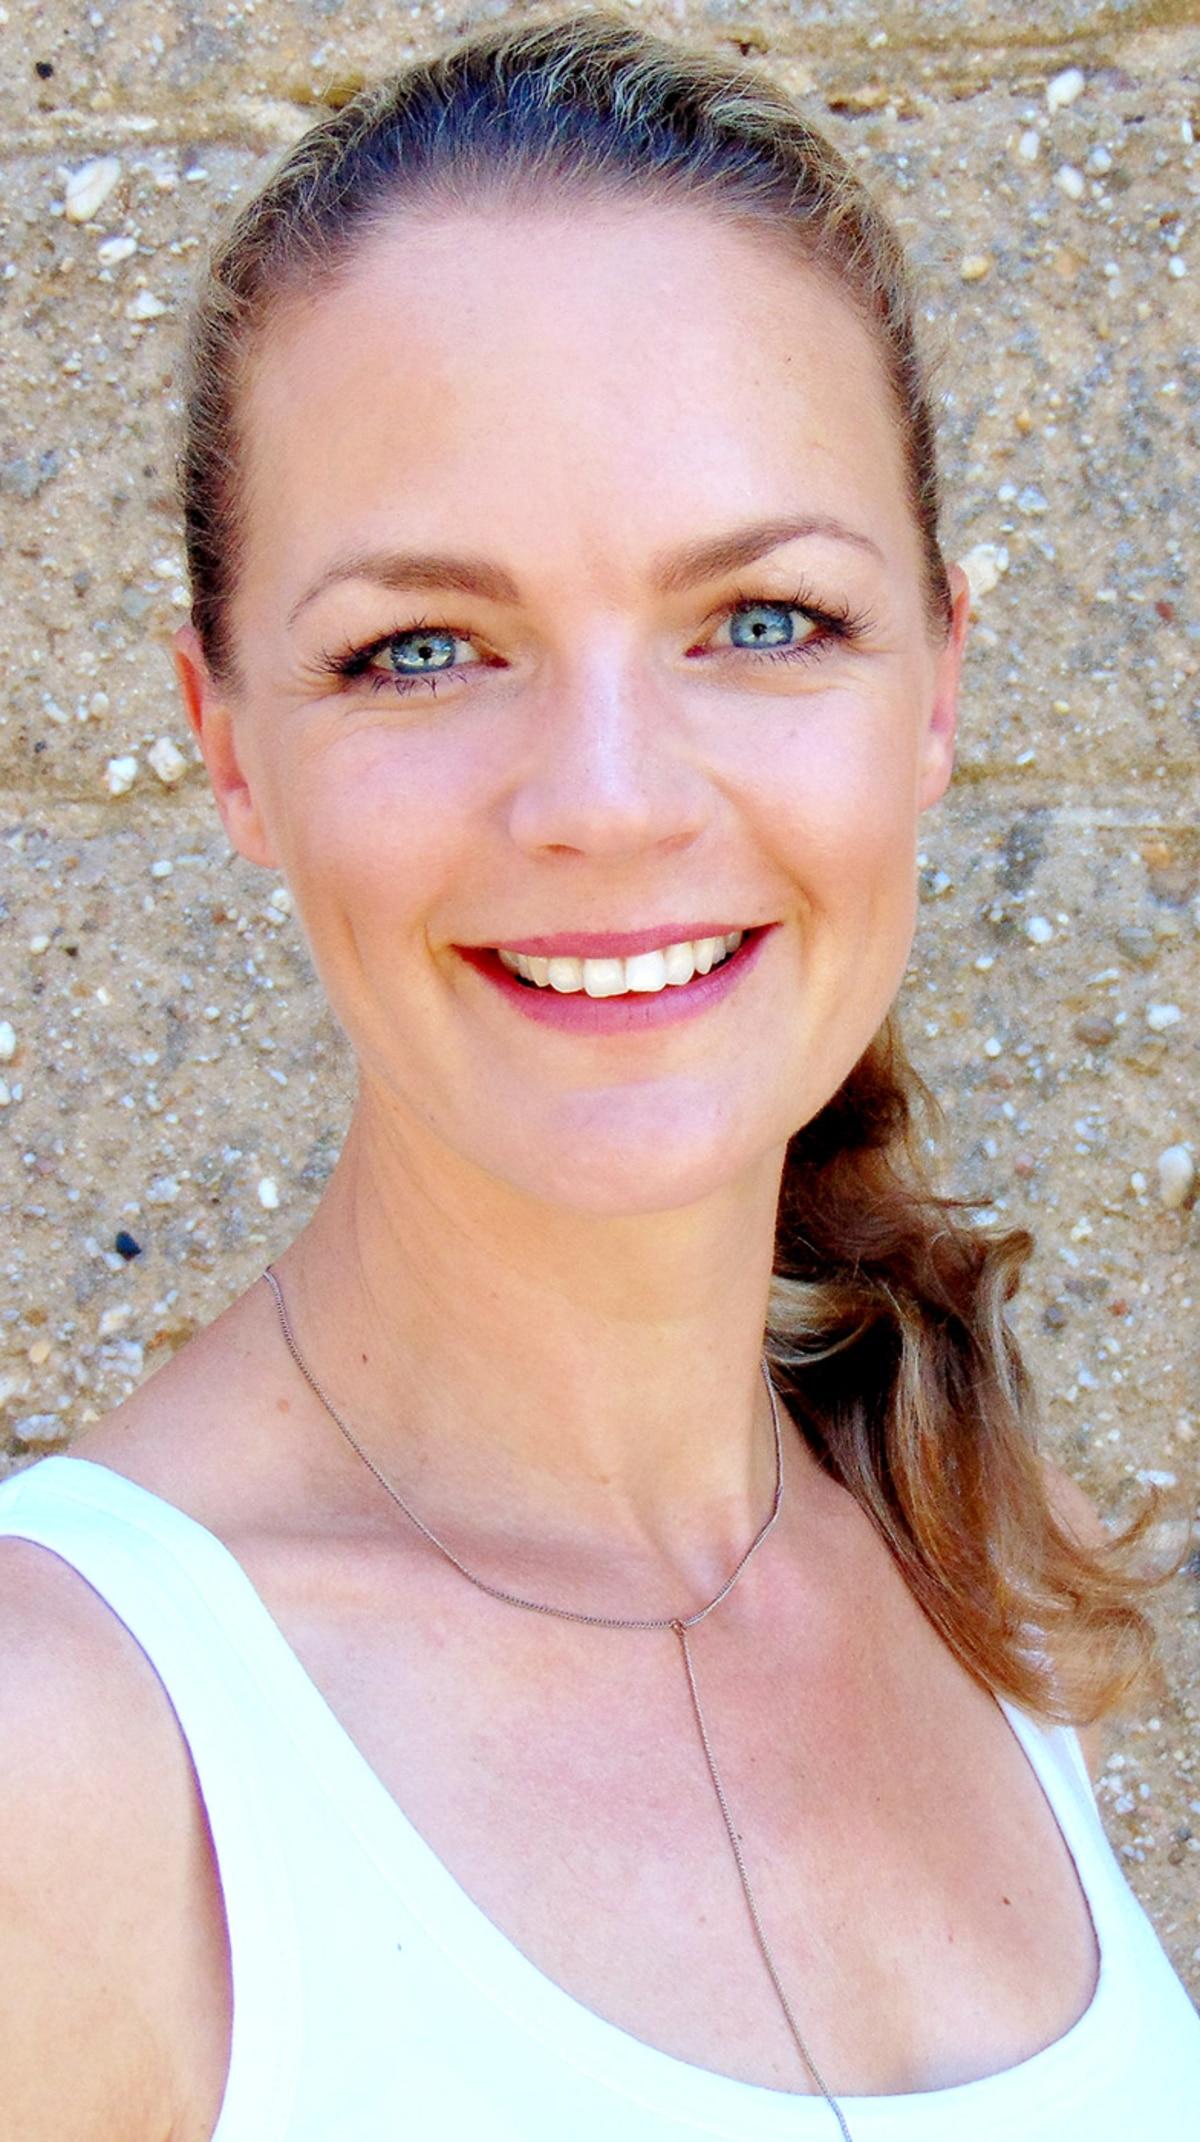 Zuhause Im Glück Eva Brenner Krank